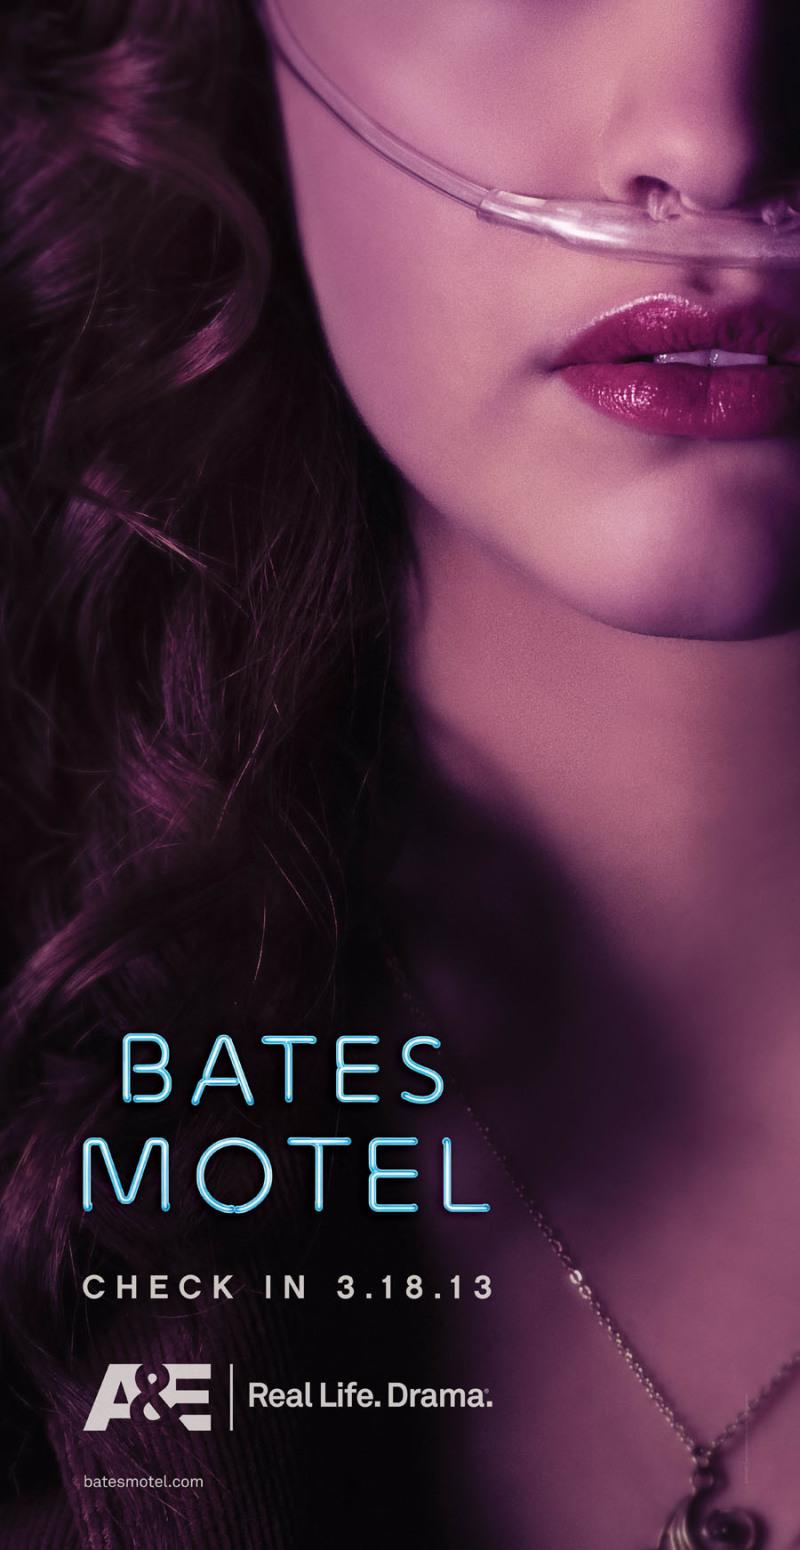 Vijf teaserposters 'Bates Motel'